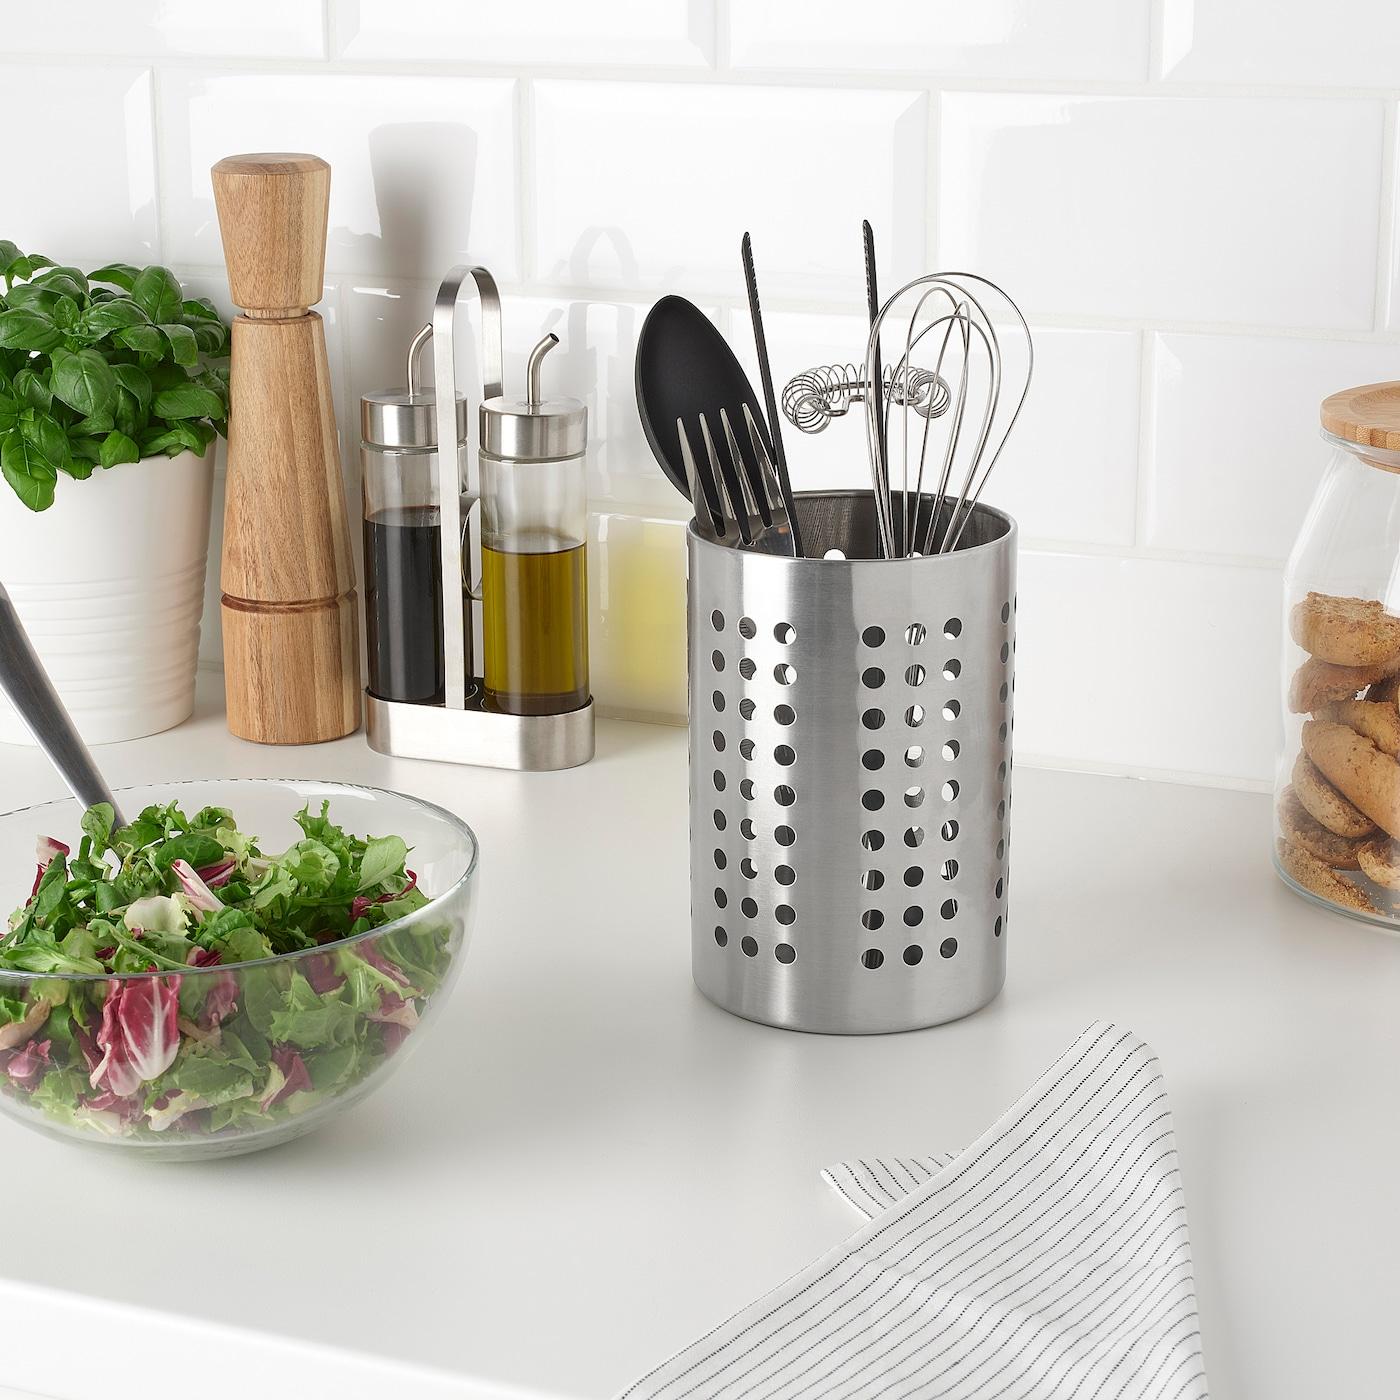 18cm Ikea semblant de cuisine ustensiles support en acier inoxydable; Couverts panier